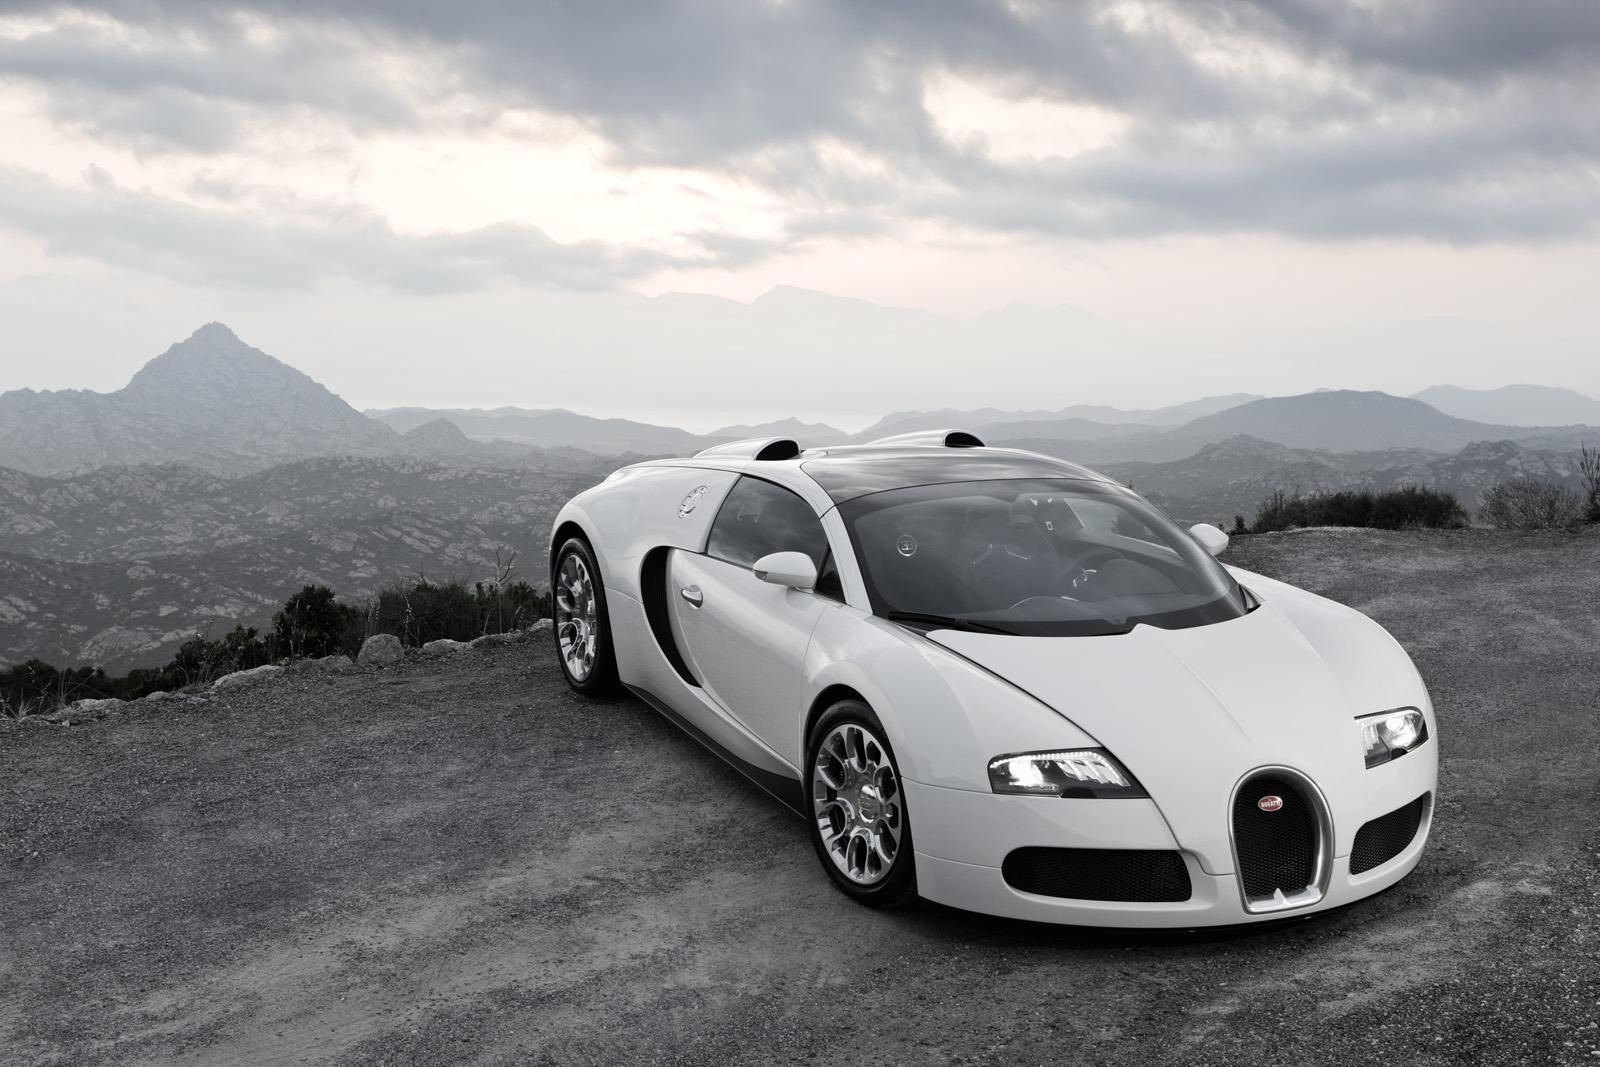 bugatti_16_4_veyron_grand_sport